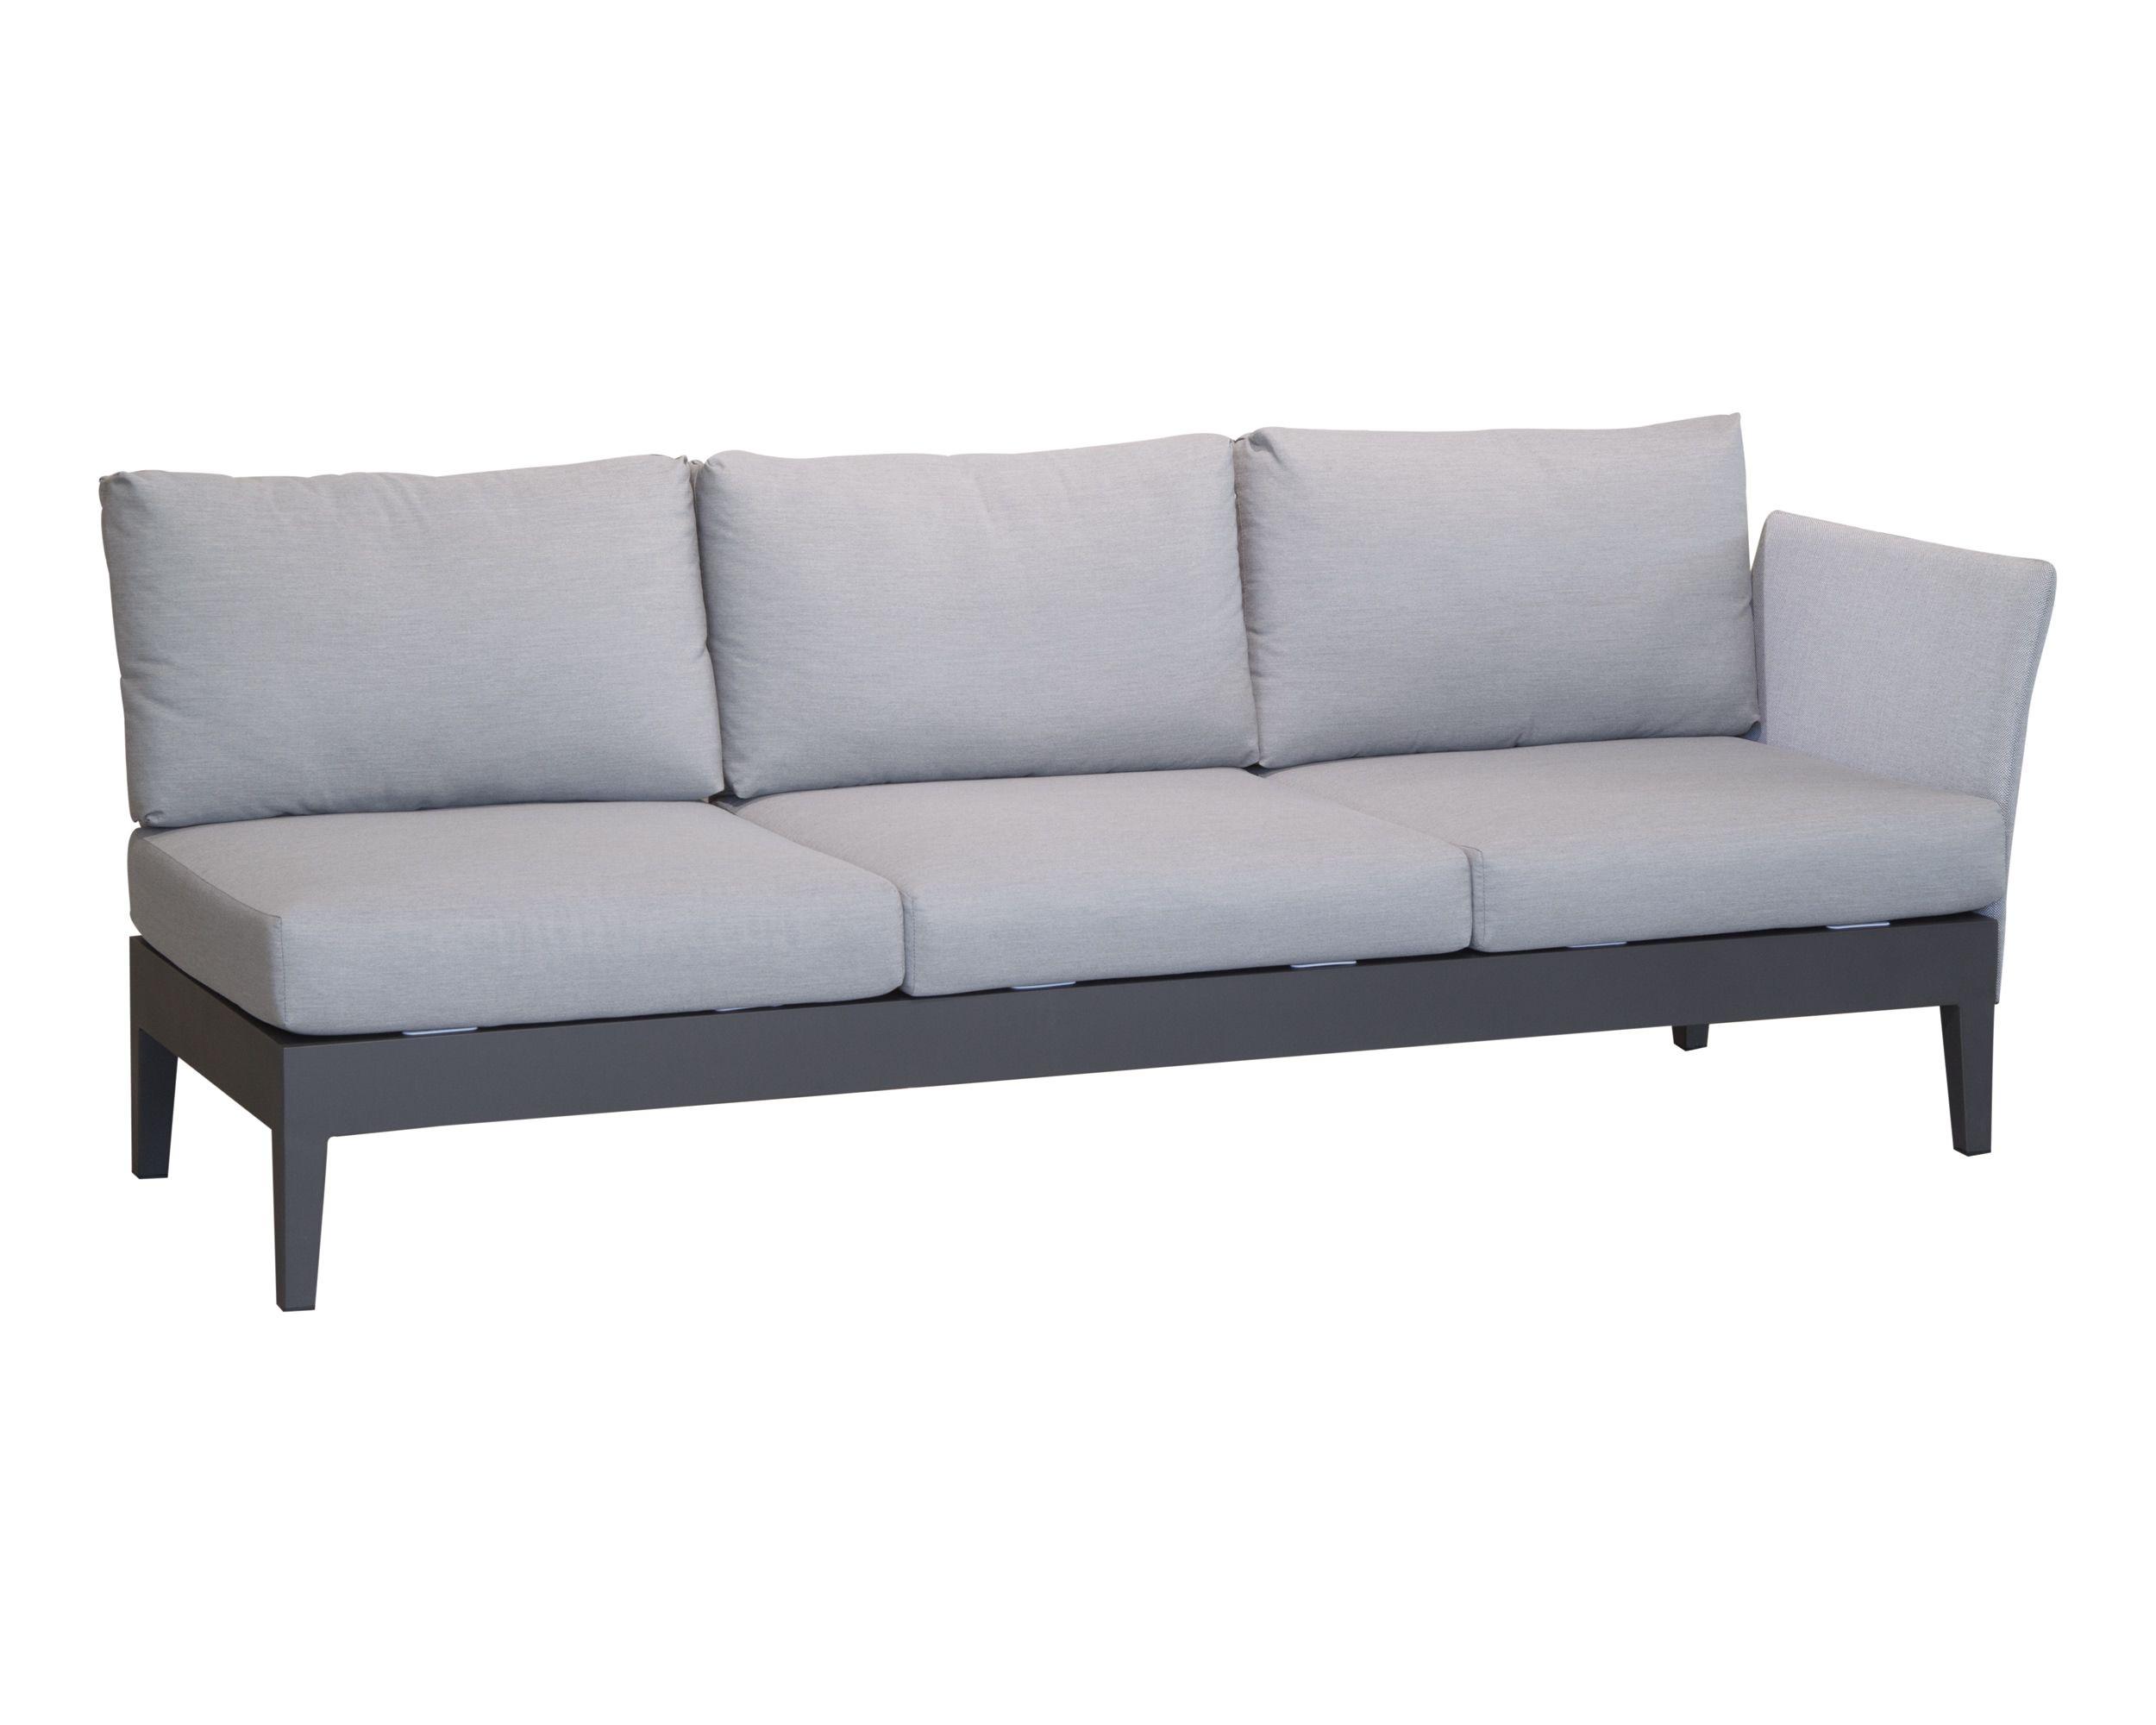 Linksmodul Olbia 3-Sitzer